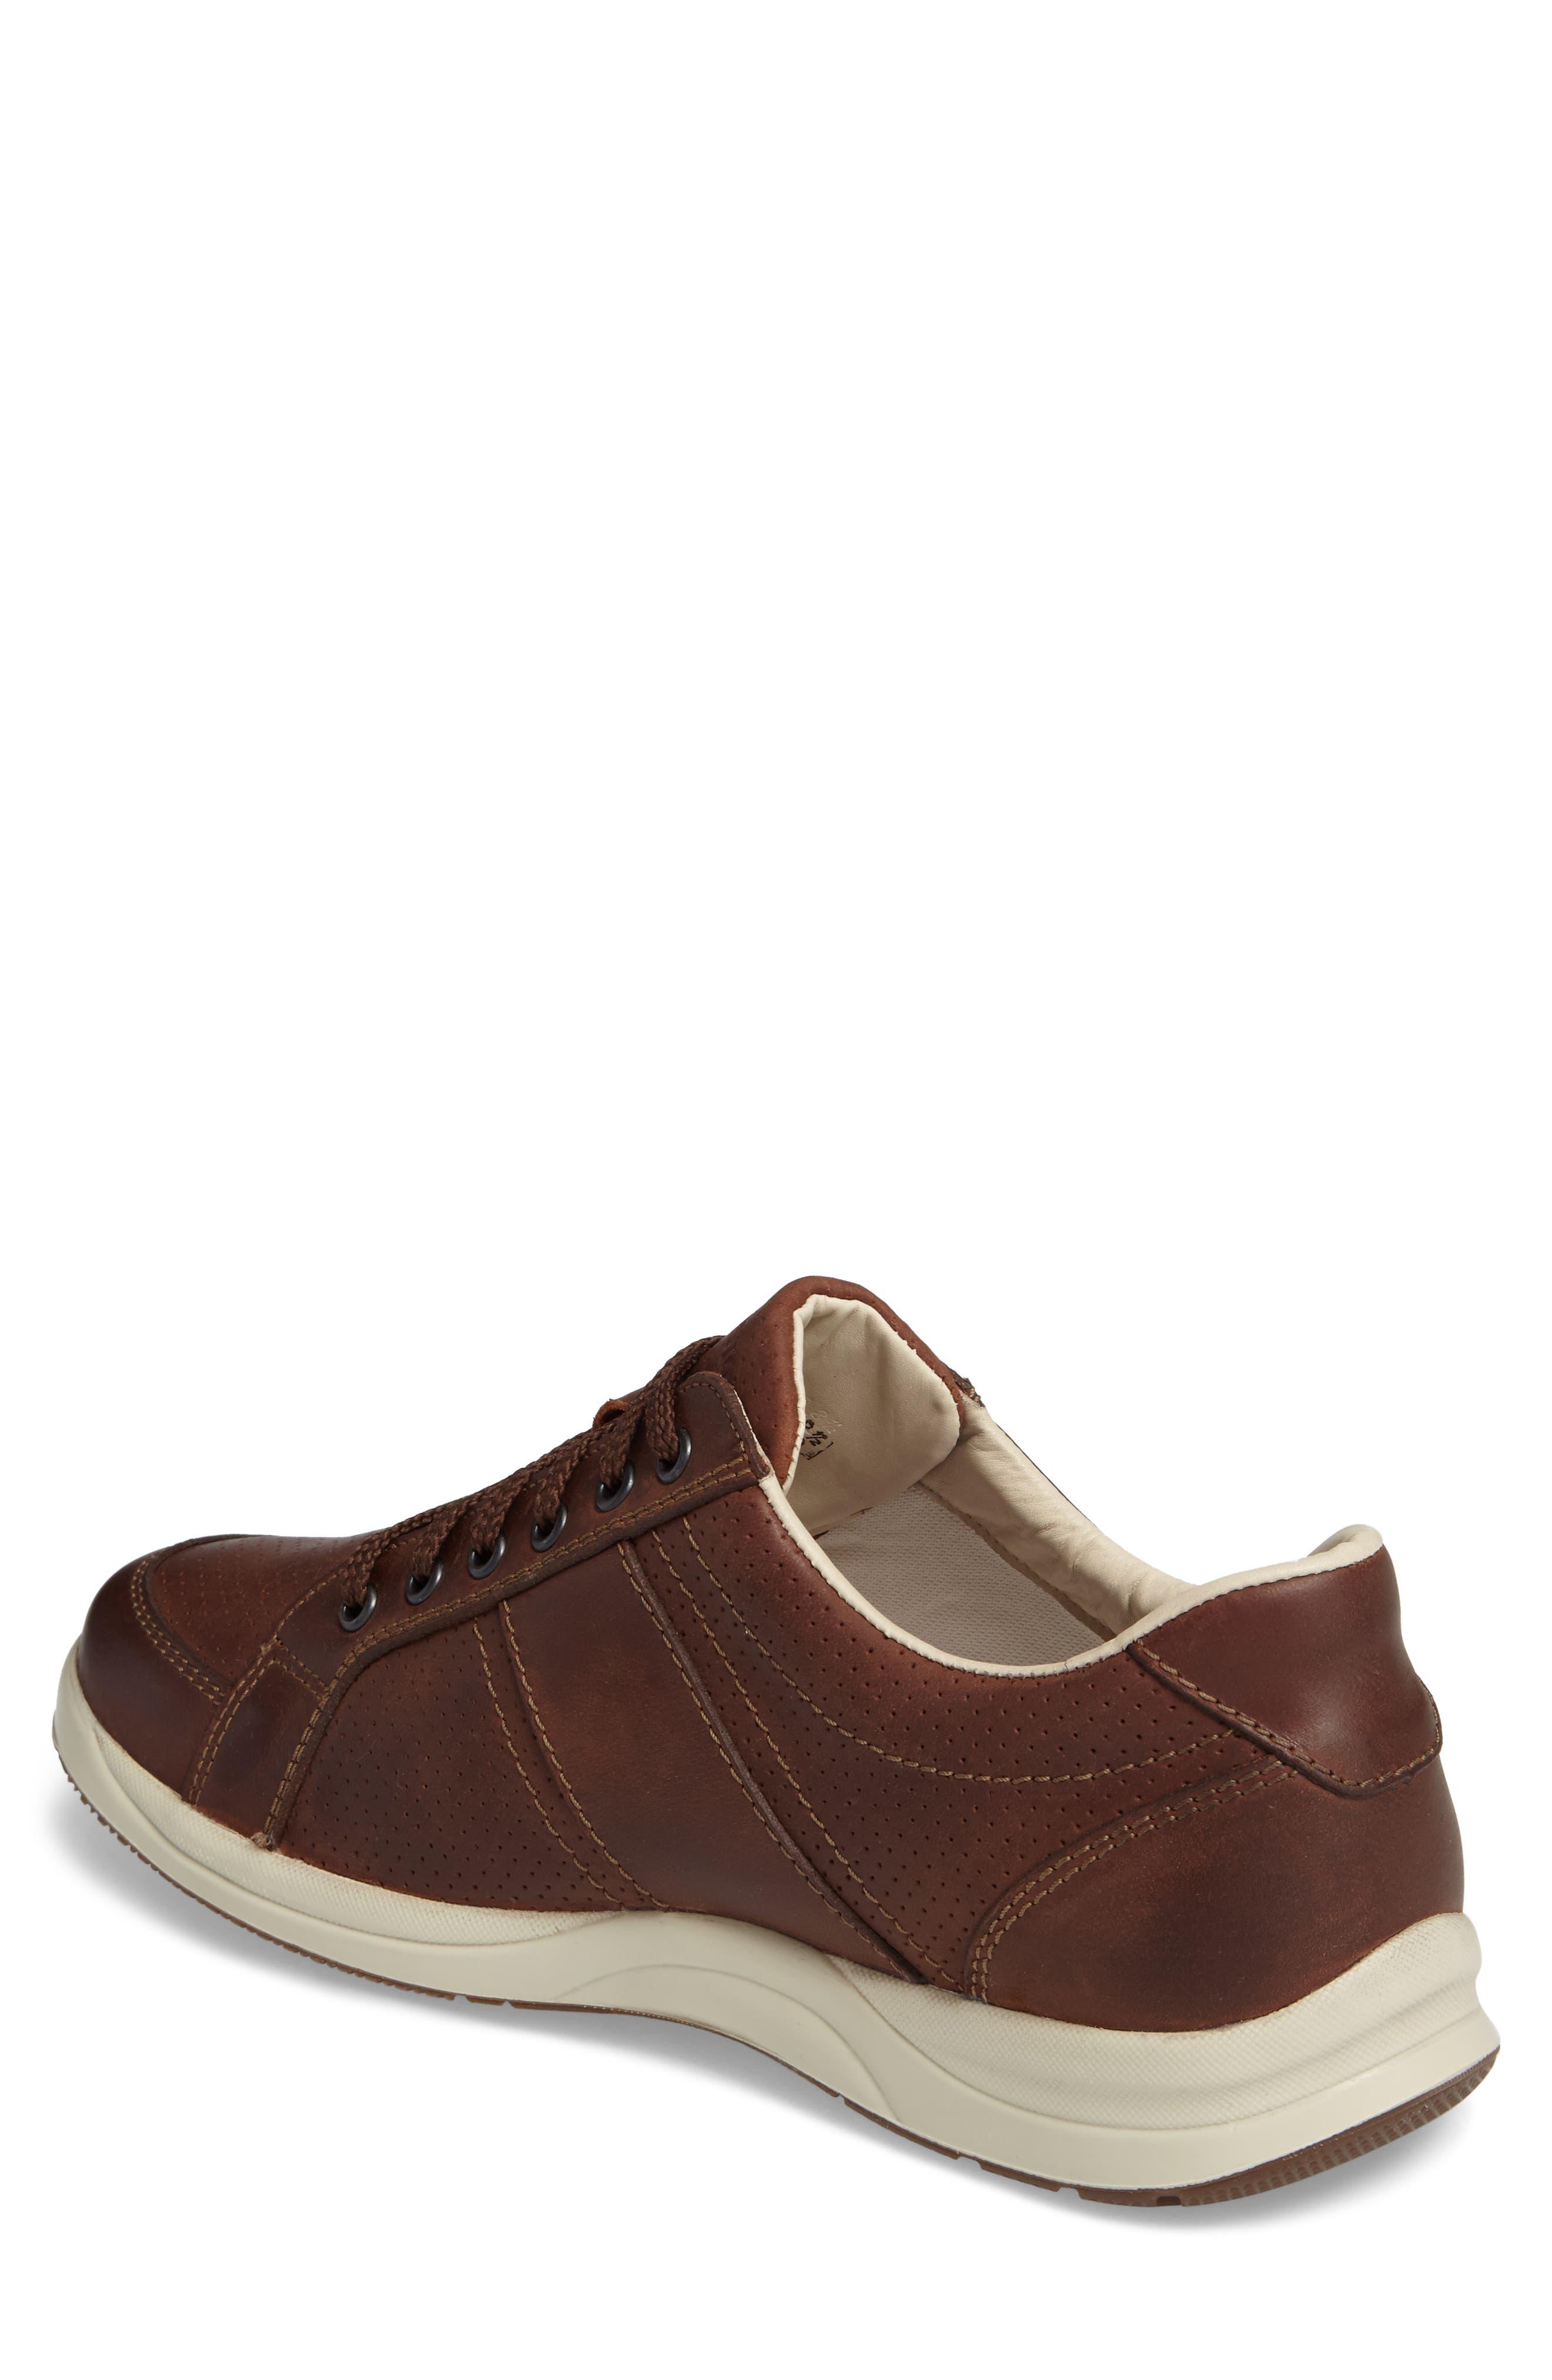 'Hero' Perforated Sneaker,                             Alternate thumbnail 2, color,                             Chestnut Nubuck Leather